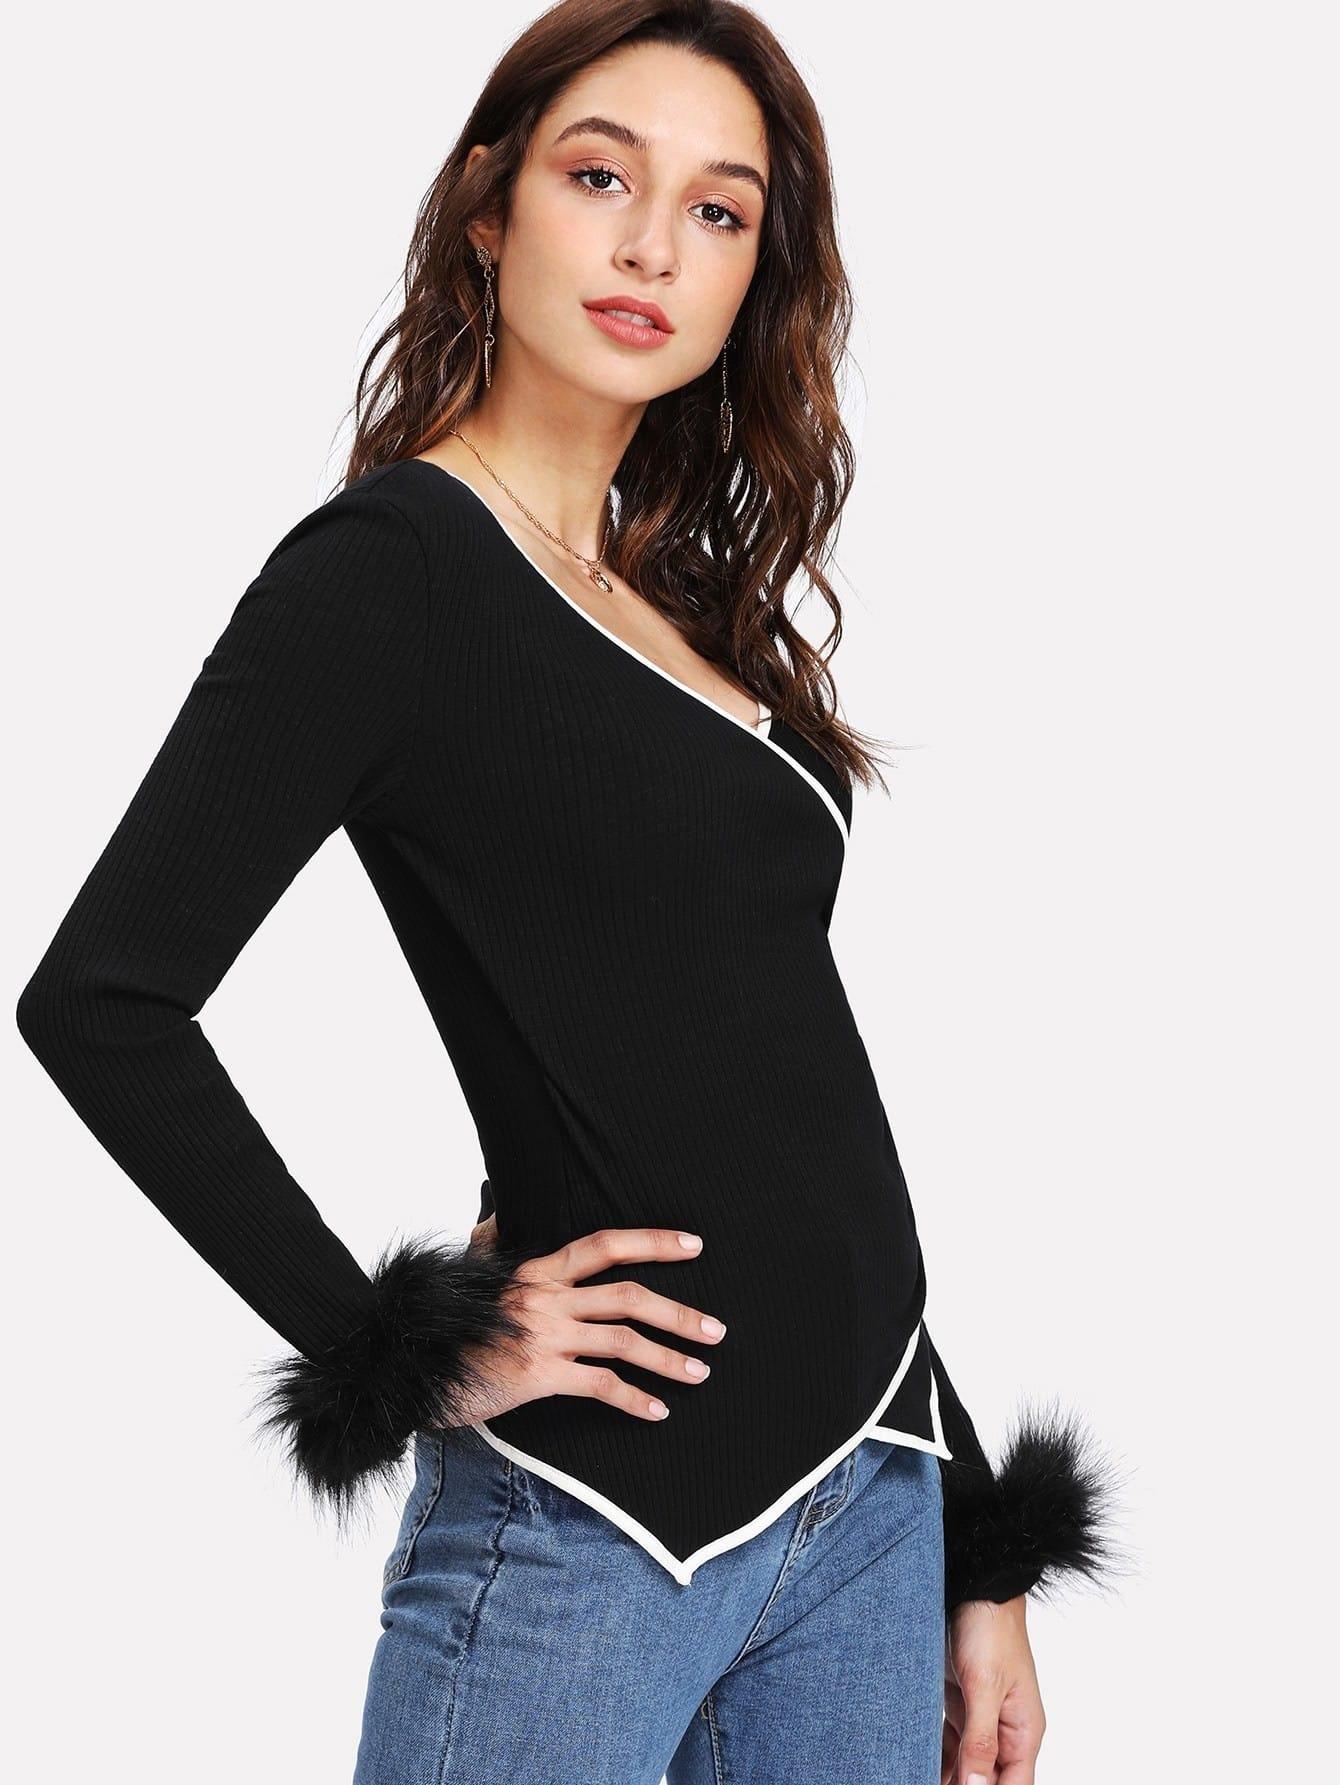 Faux Fur Cuff Contrast Binding Wrap T-shirt contrast faux fur cuff pullover